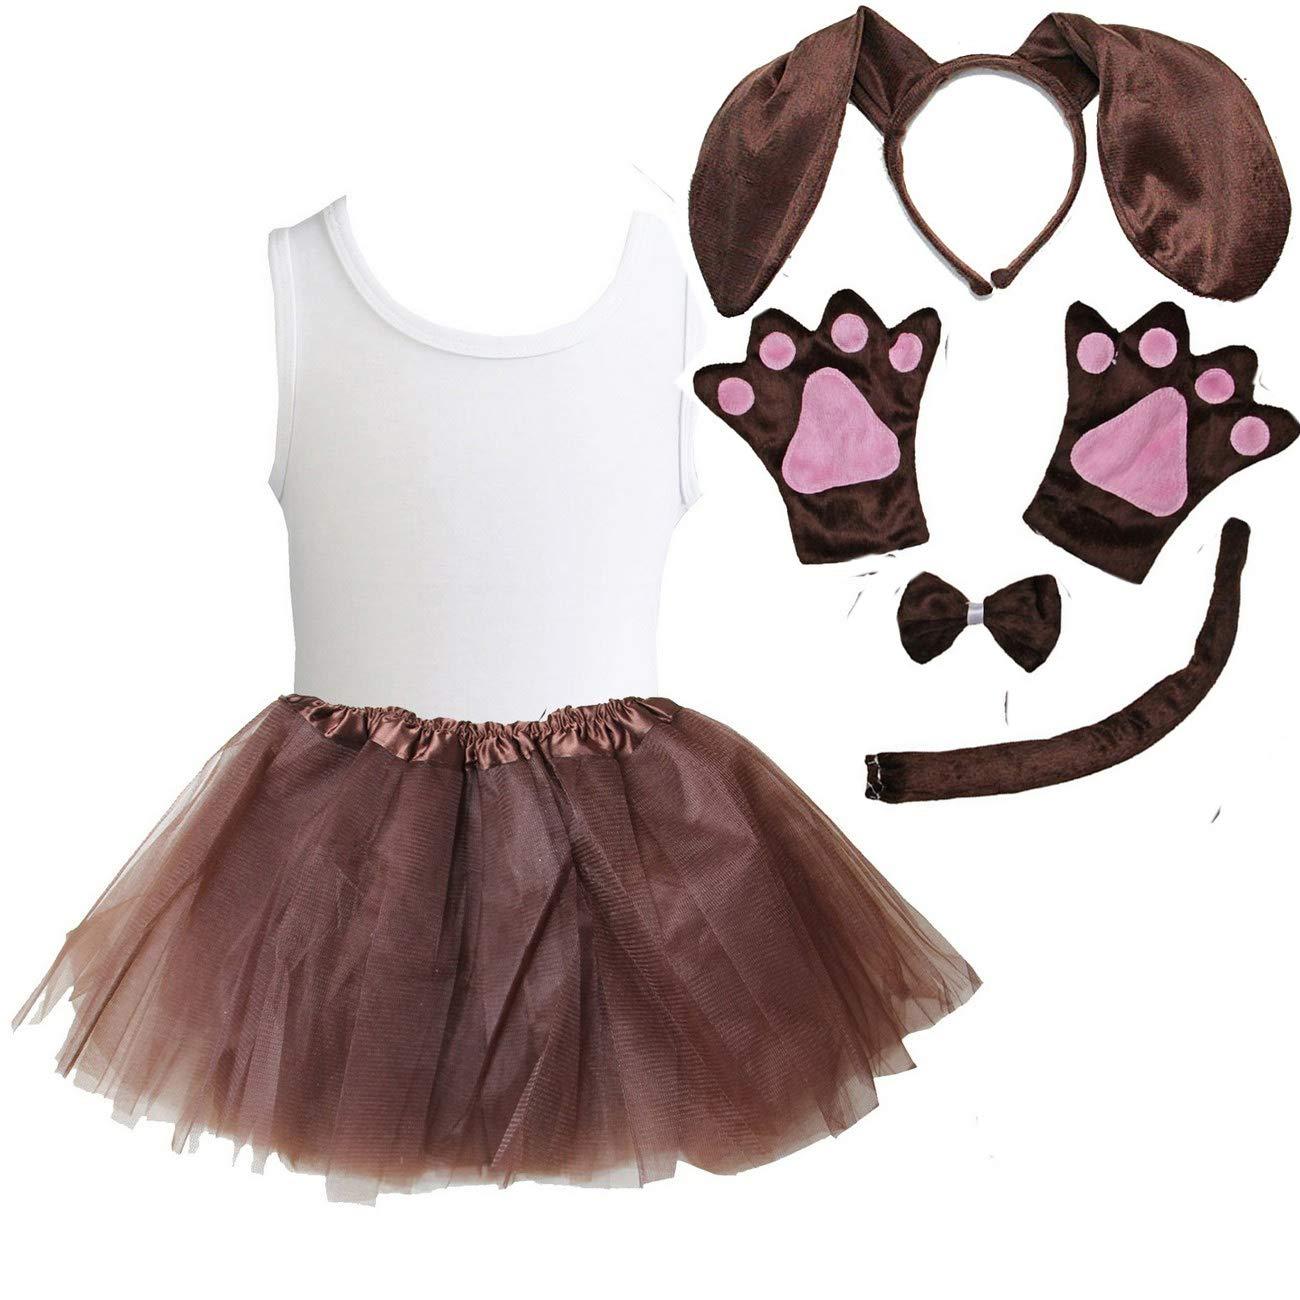 Kirei Sui Kids Animal Costume Ears Headband Bowtie Tail Tutu Paws Tee 7pcs Set